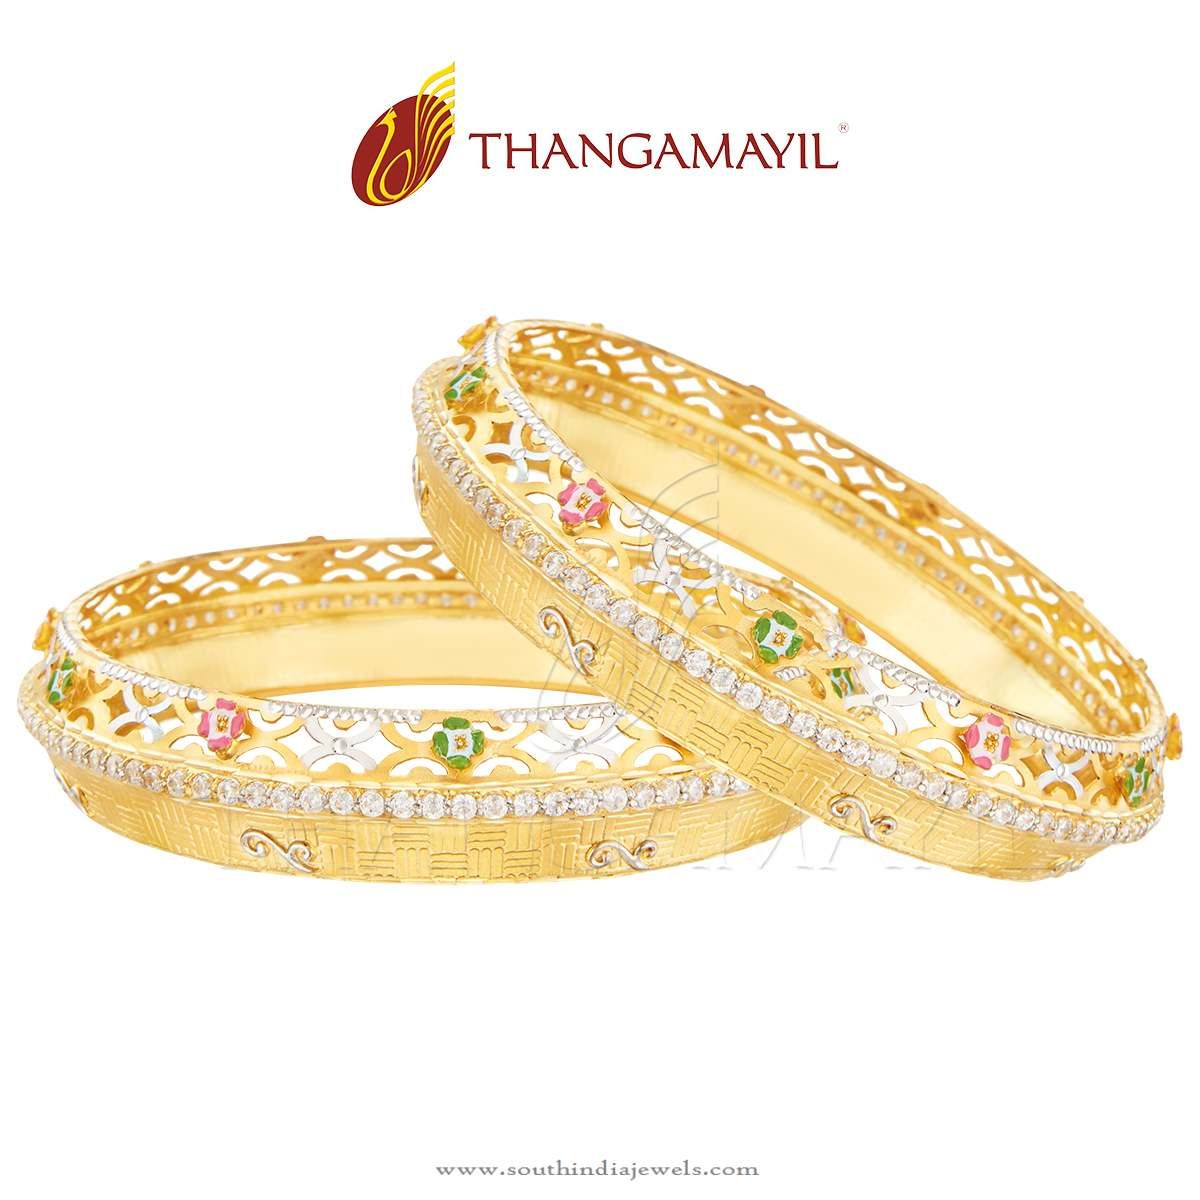 22k Gold Broad Stone Bangle Set From Thangamayil Jewellery ...